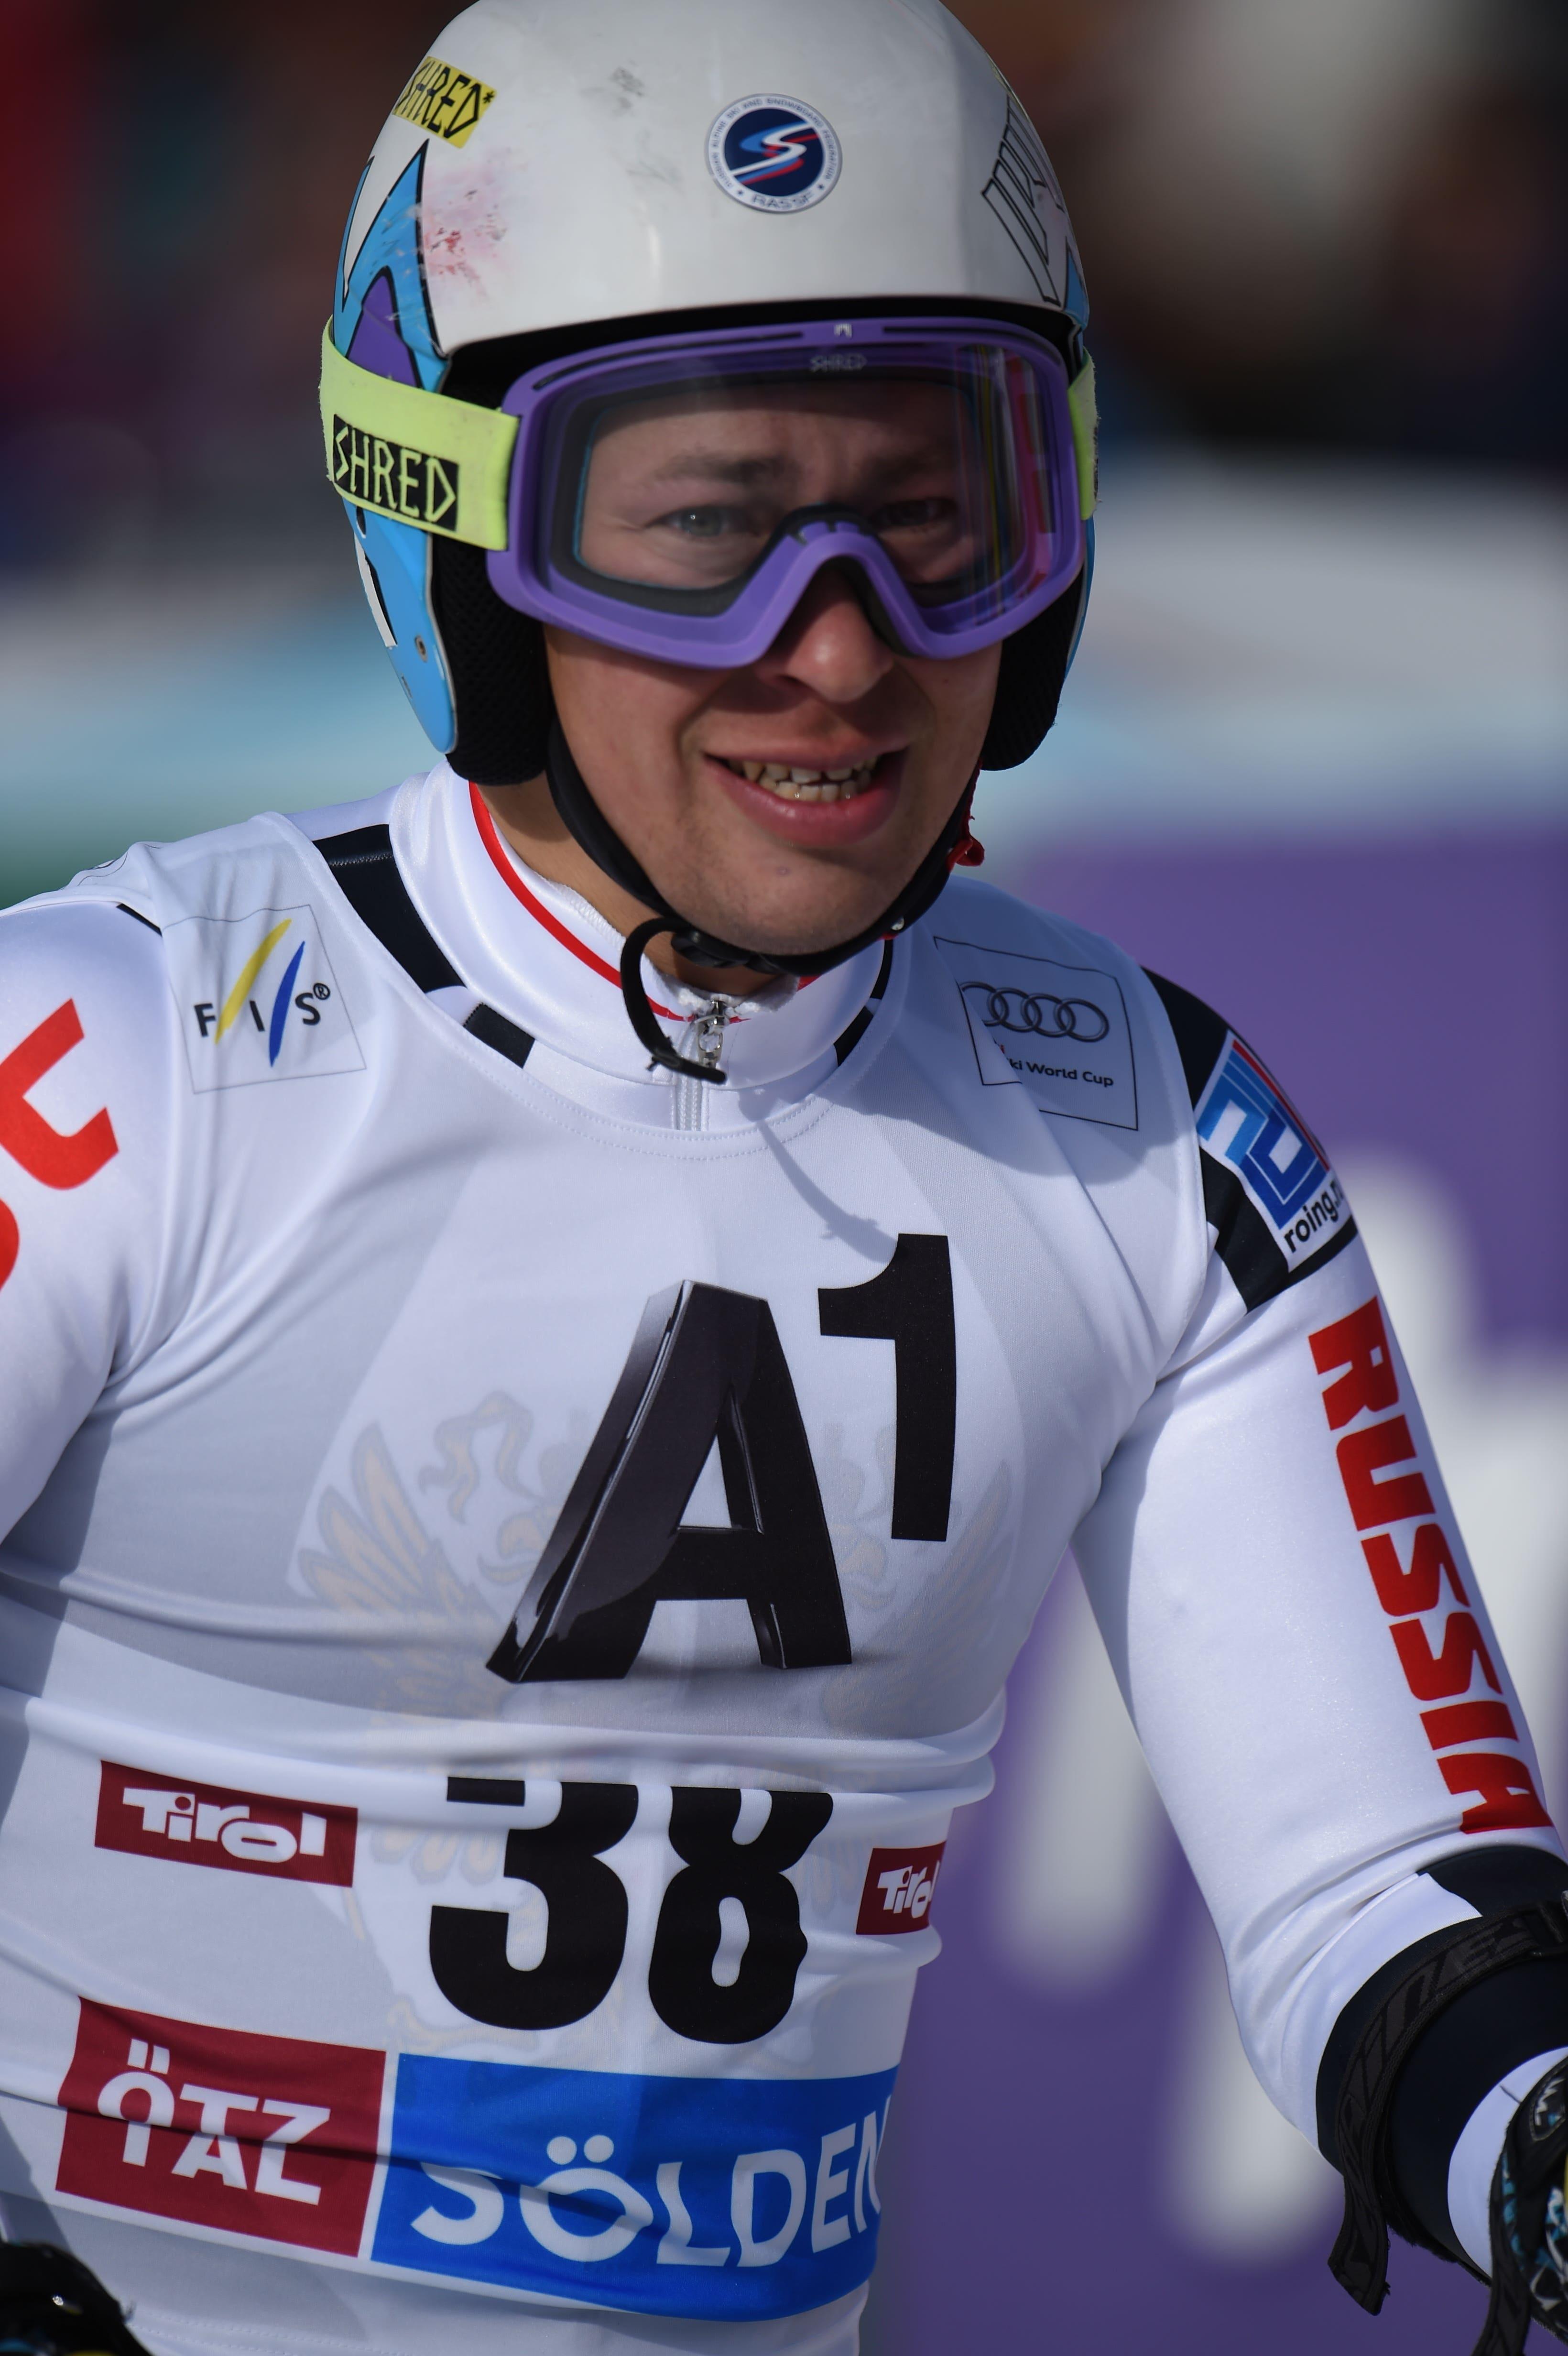 Aleksander ANDRIENKO